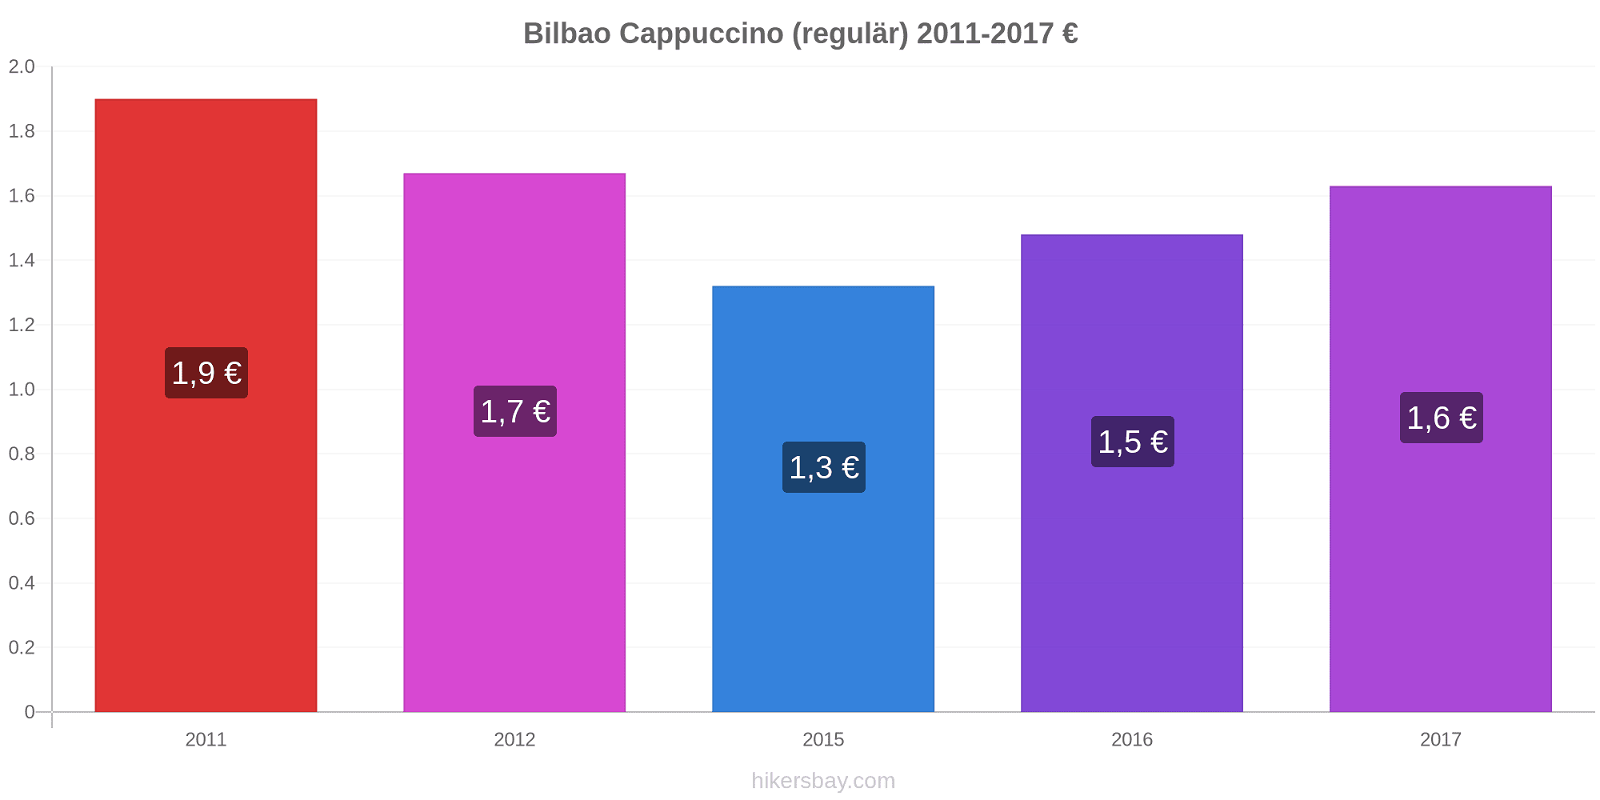 Bilbao Preisänderungen Cappuccino (regulär) hikersbay.com